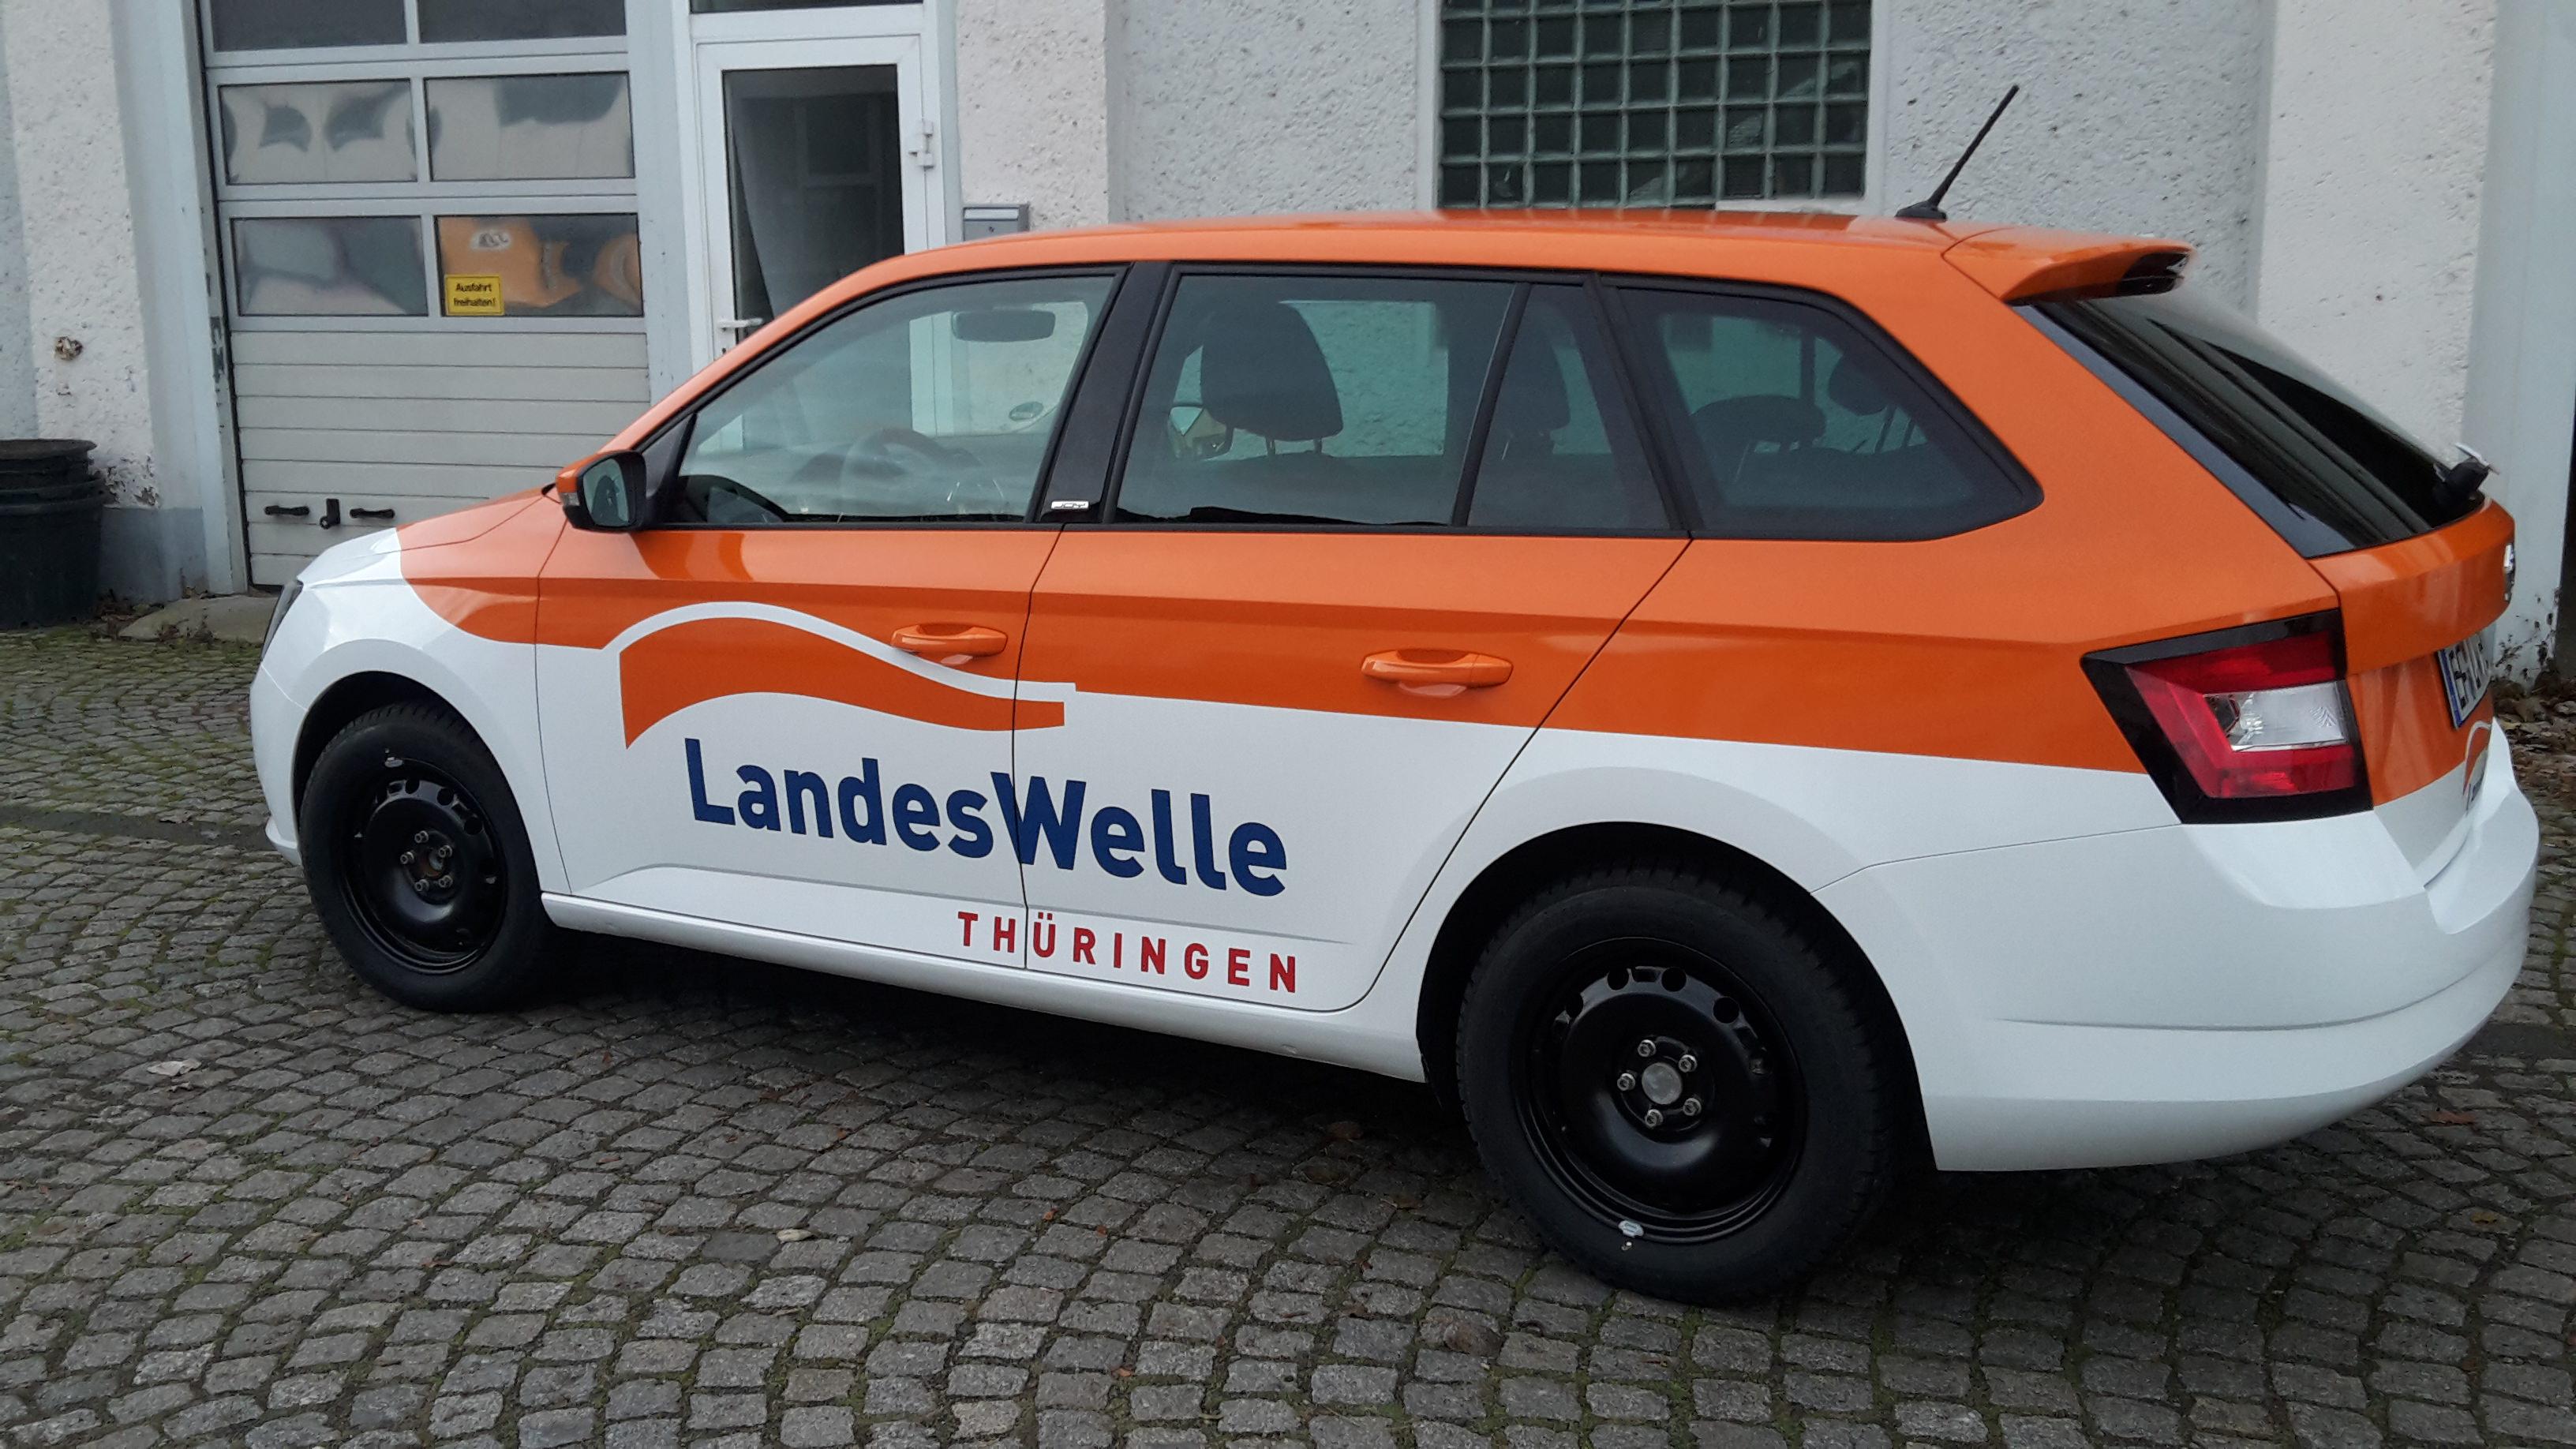 Fahrzeugbeschriftung Landeswelle